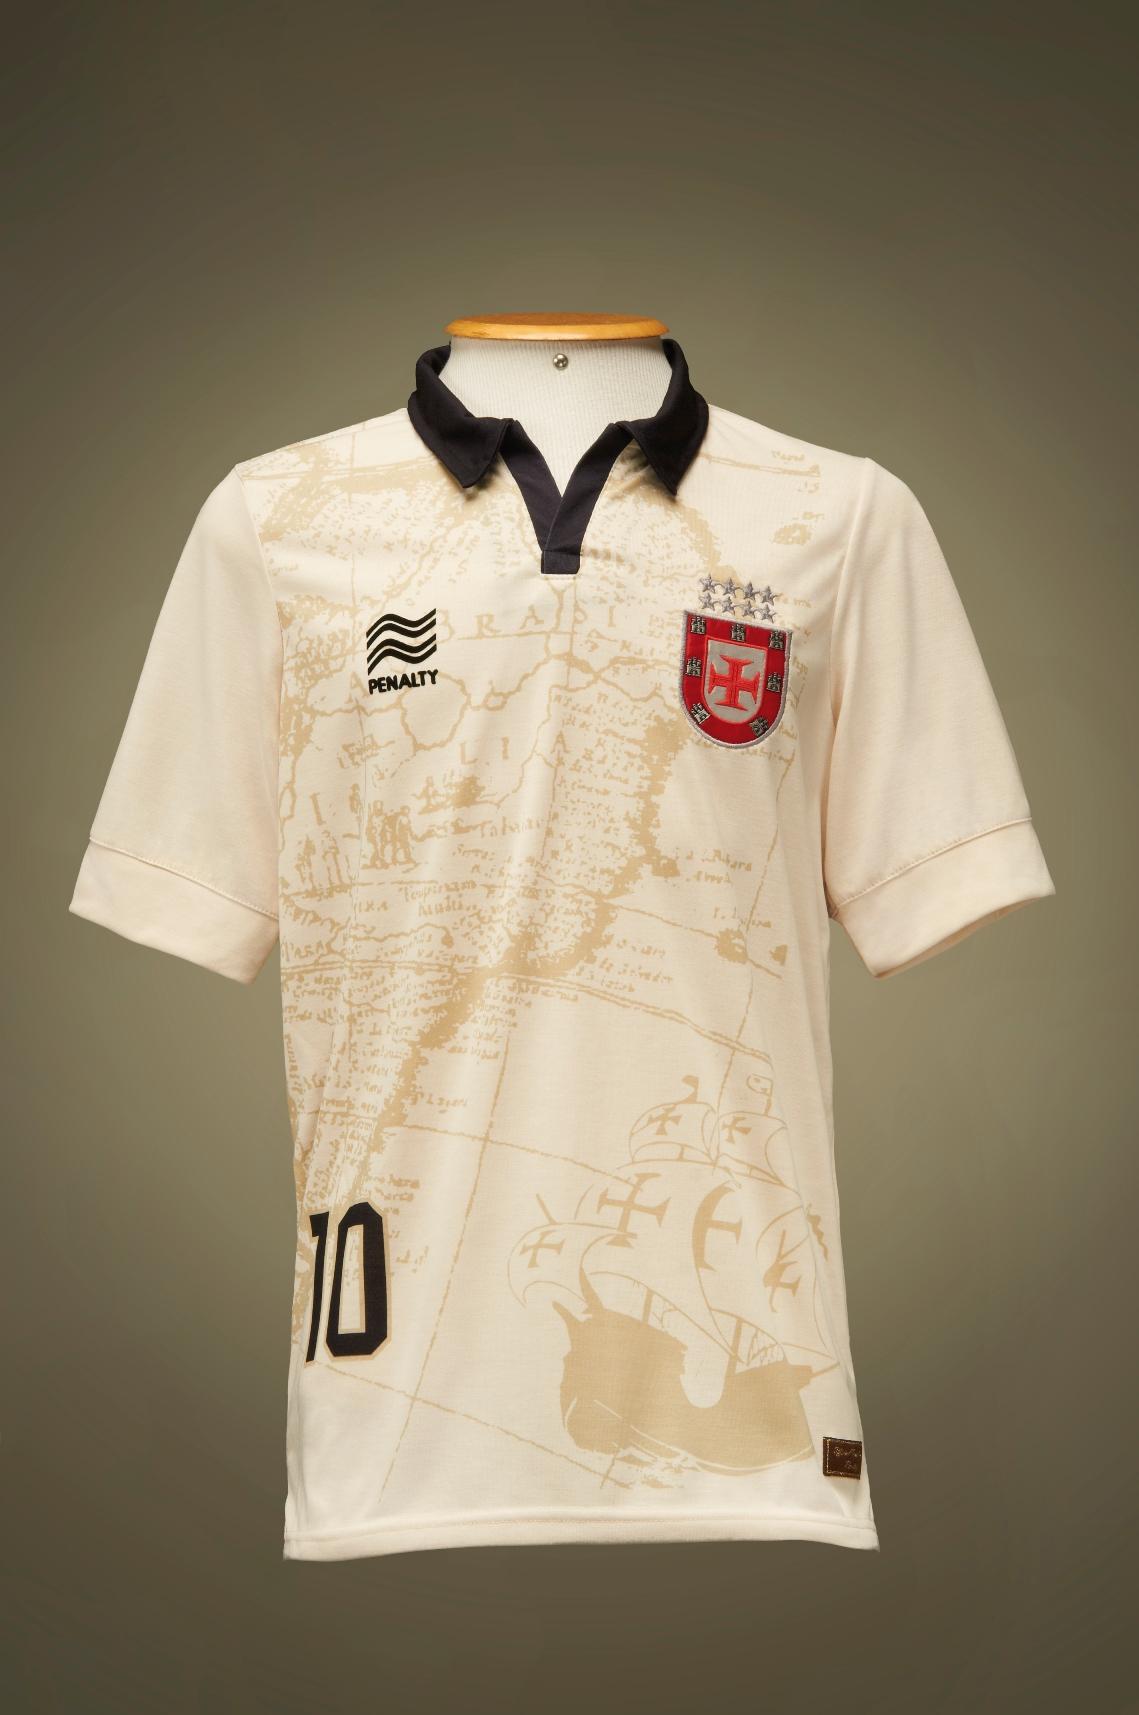 c1eed0a36b Vasco - uniforme 3 Vasco Raiz - Temporada 2013